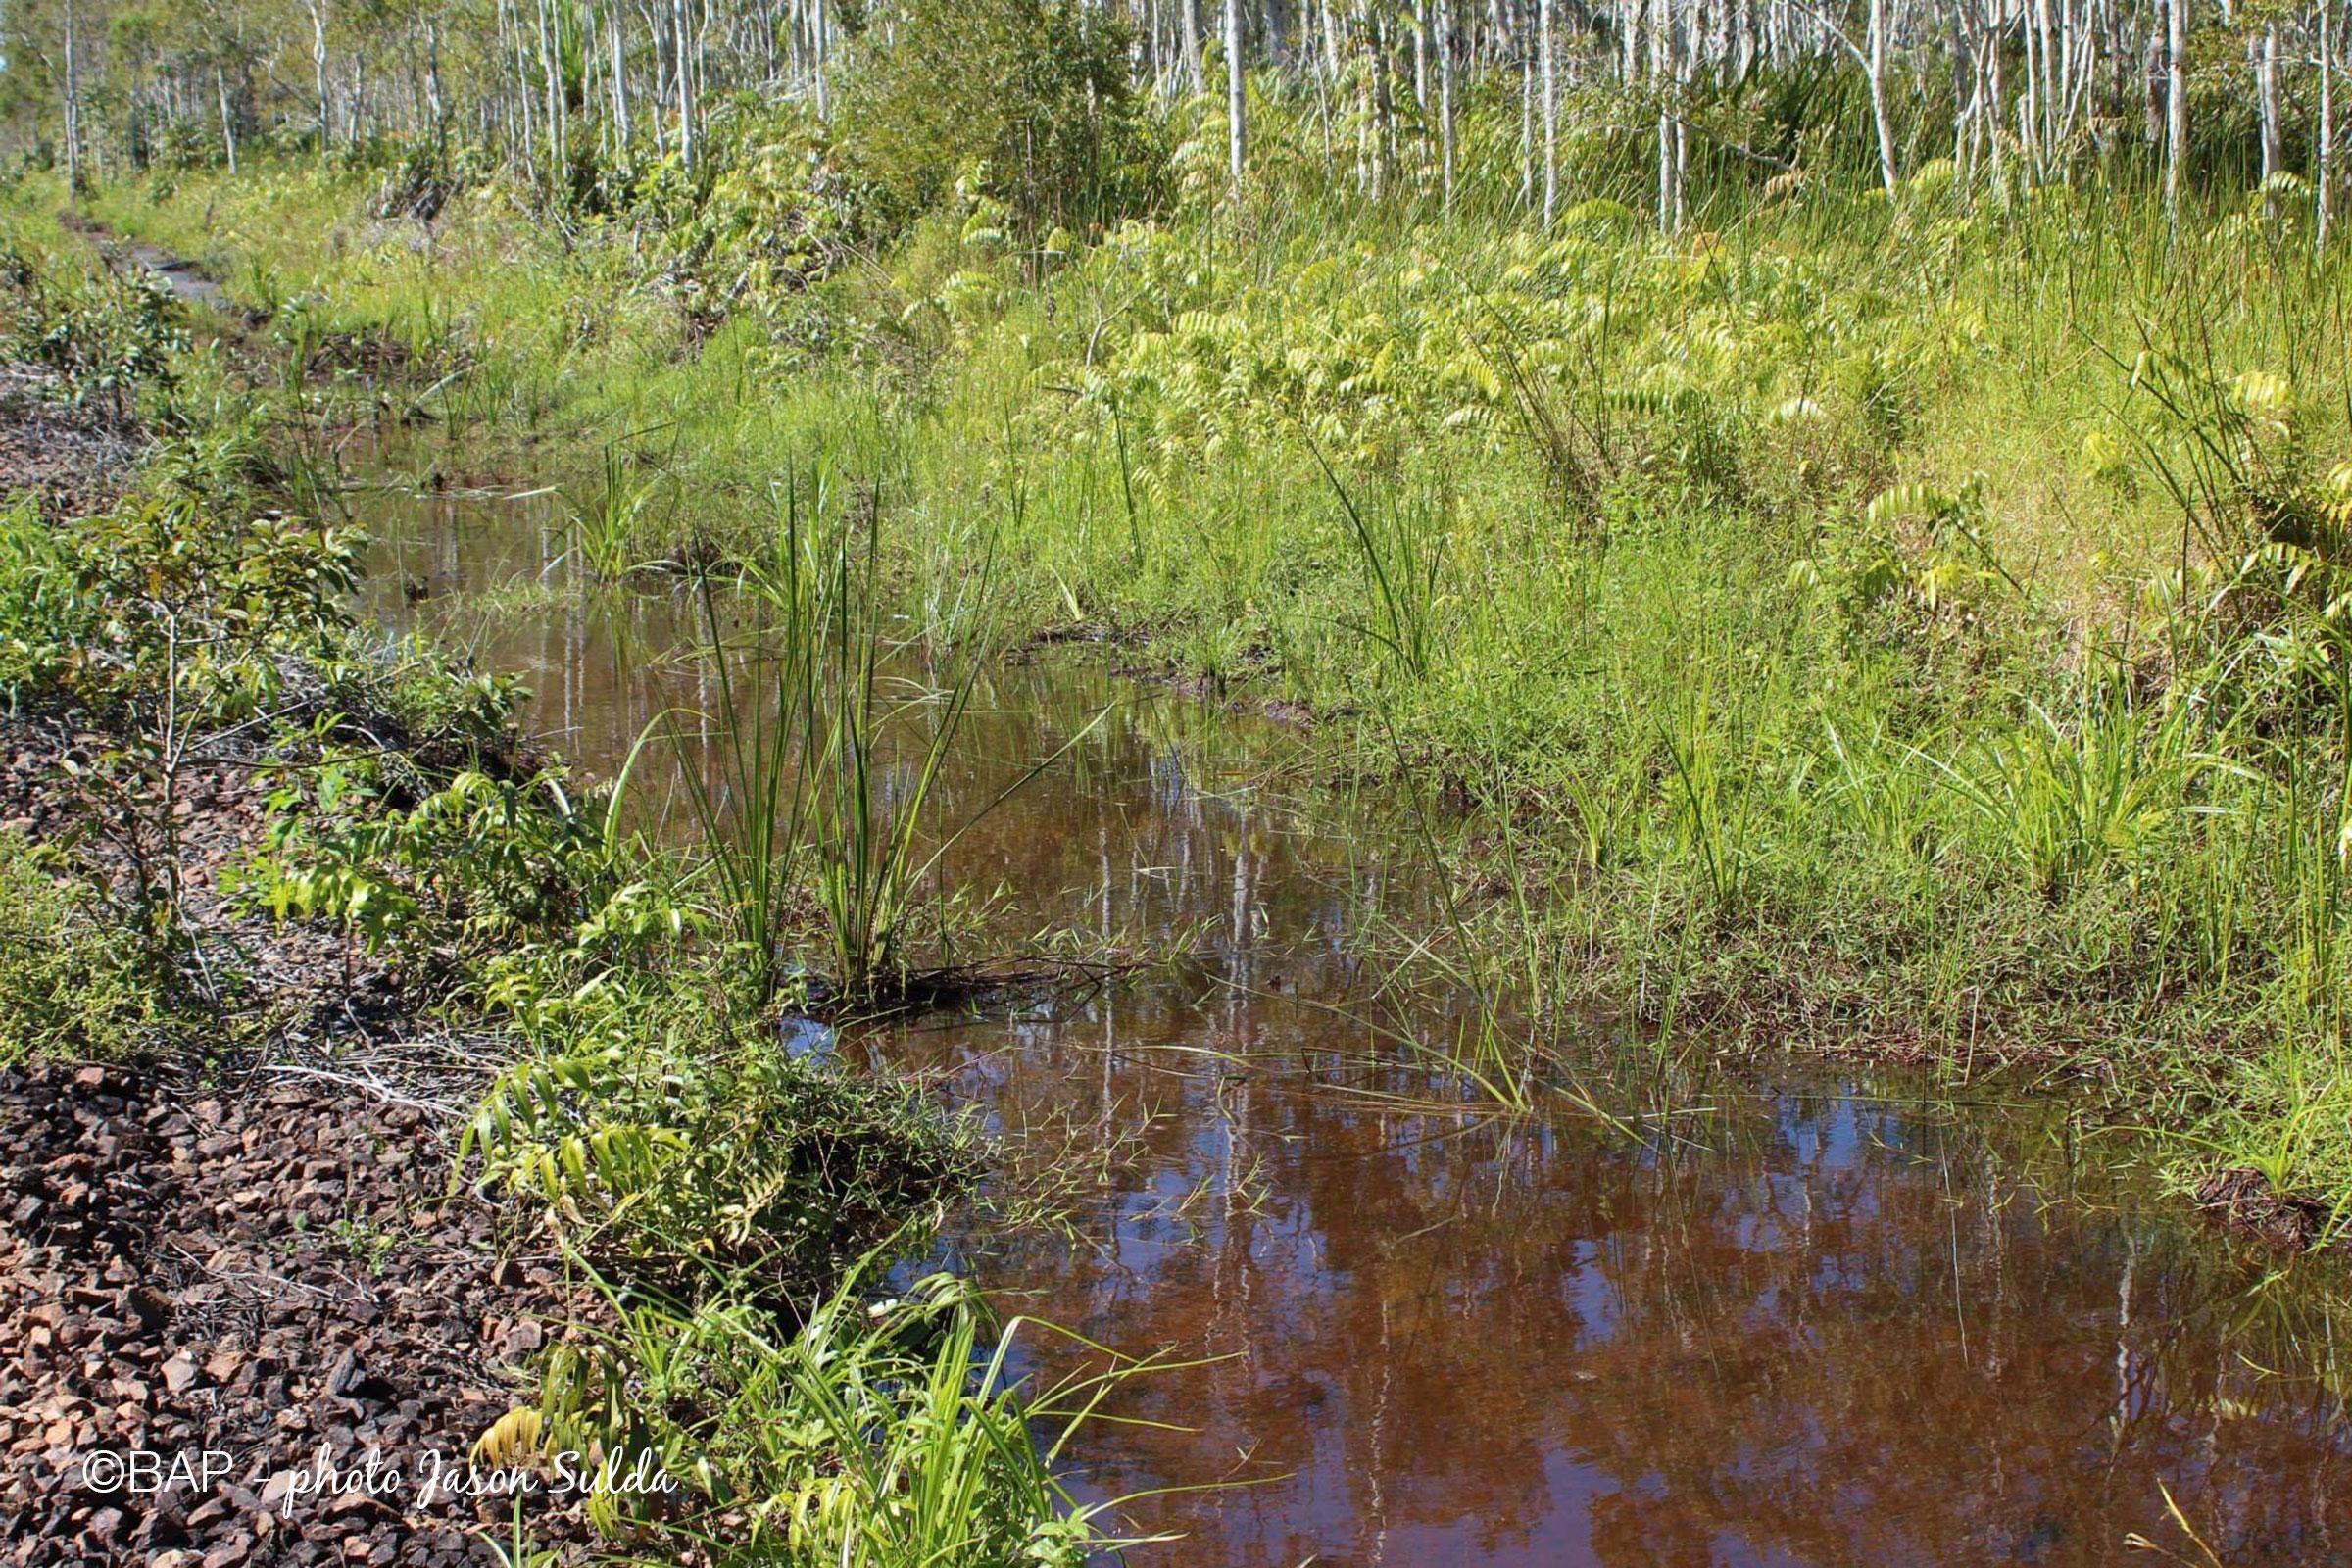 BIN, Eubenangee Swamp, North Queensland. ©BAP, photo Jason Sulda